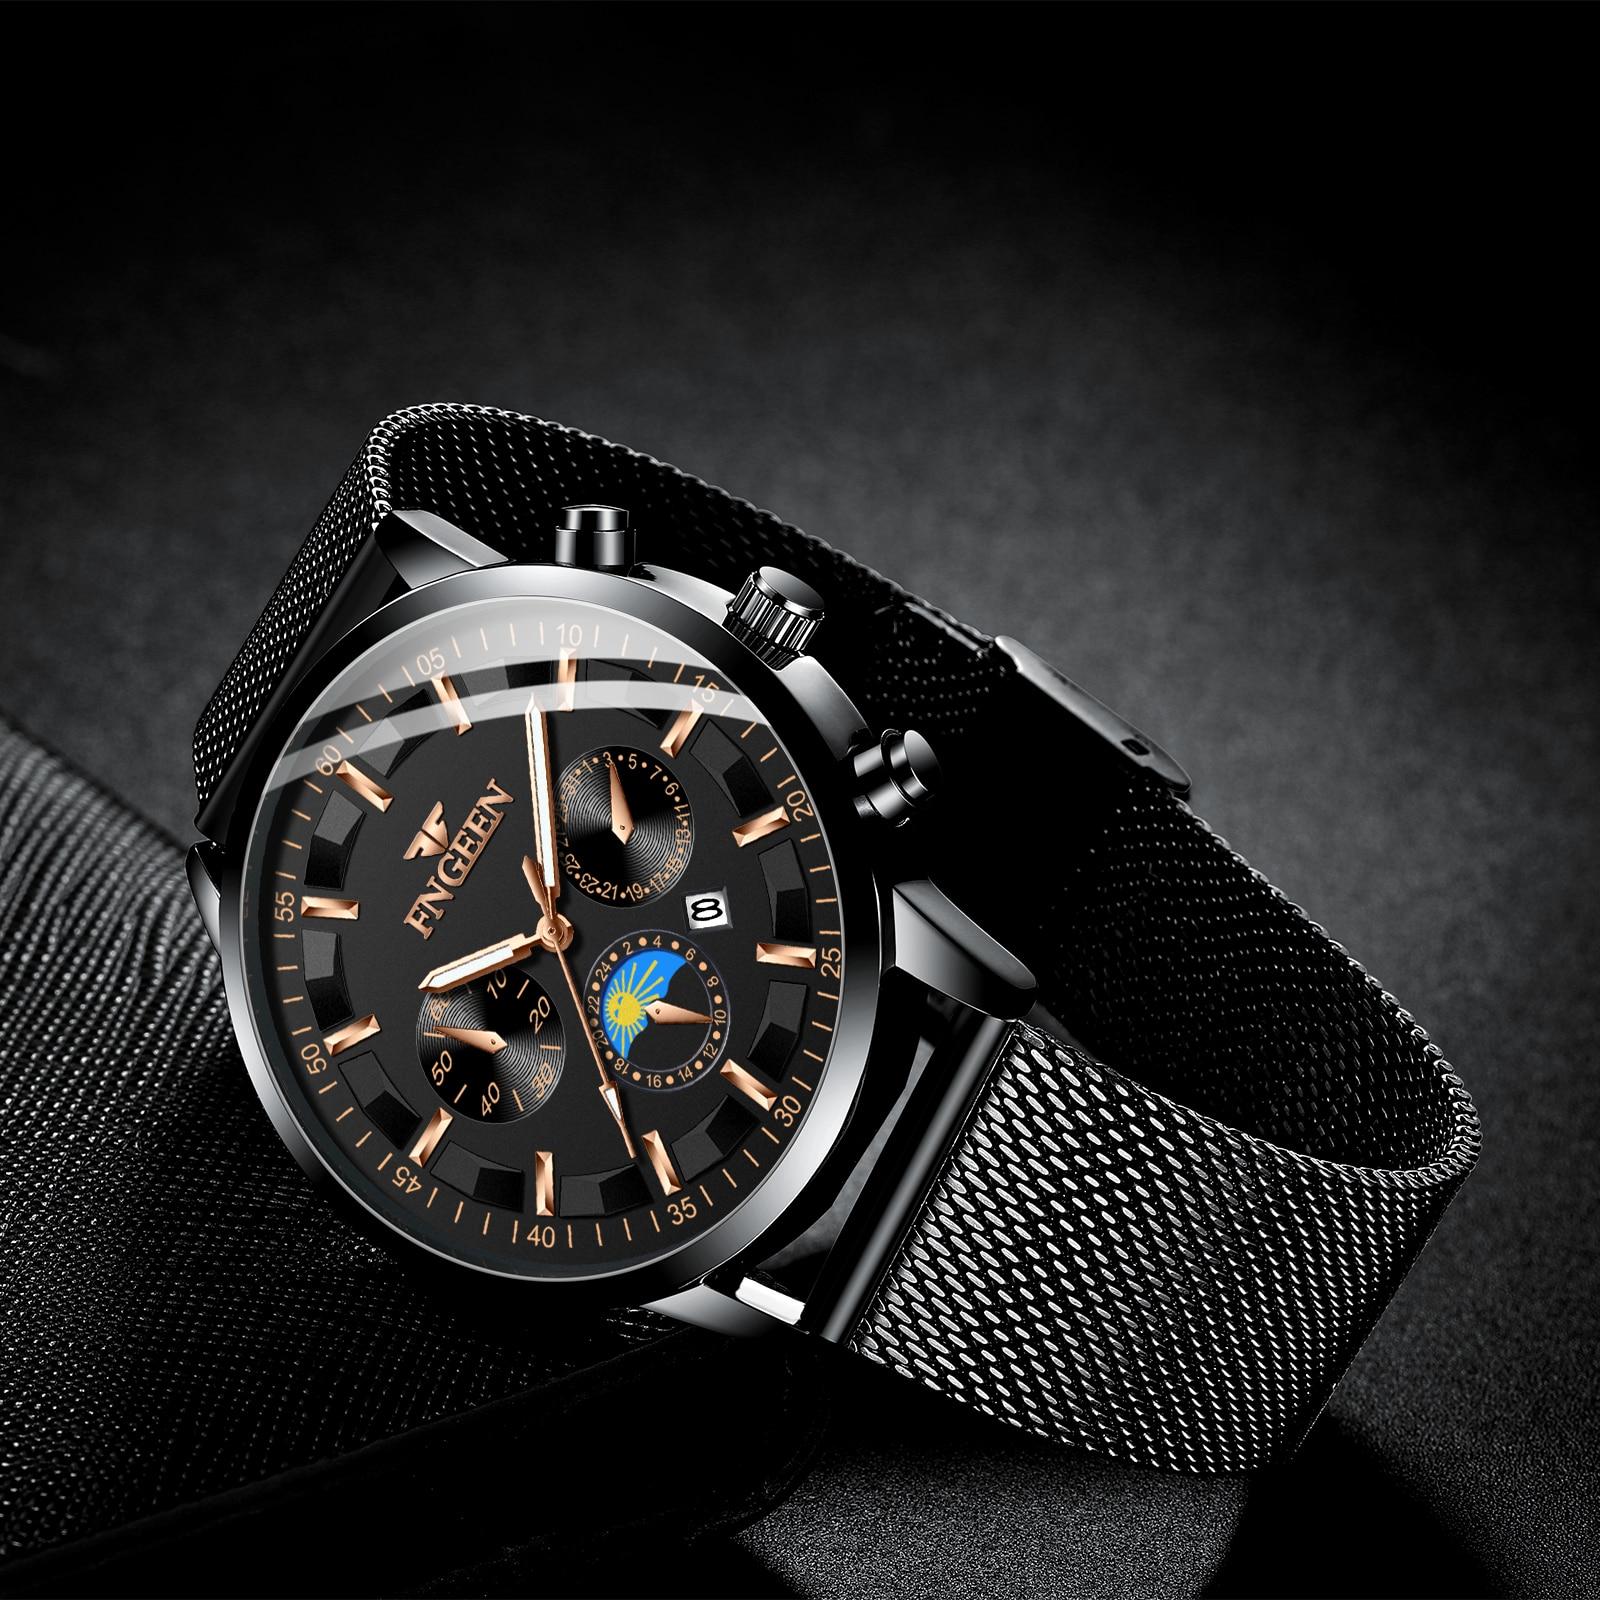 2021 New Fashion Mens Watches with Stainless Steel Top Brand Luxury Sports Quartz Watch men's watch wristwatch